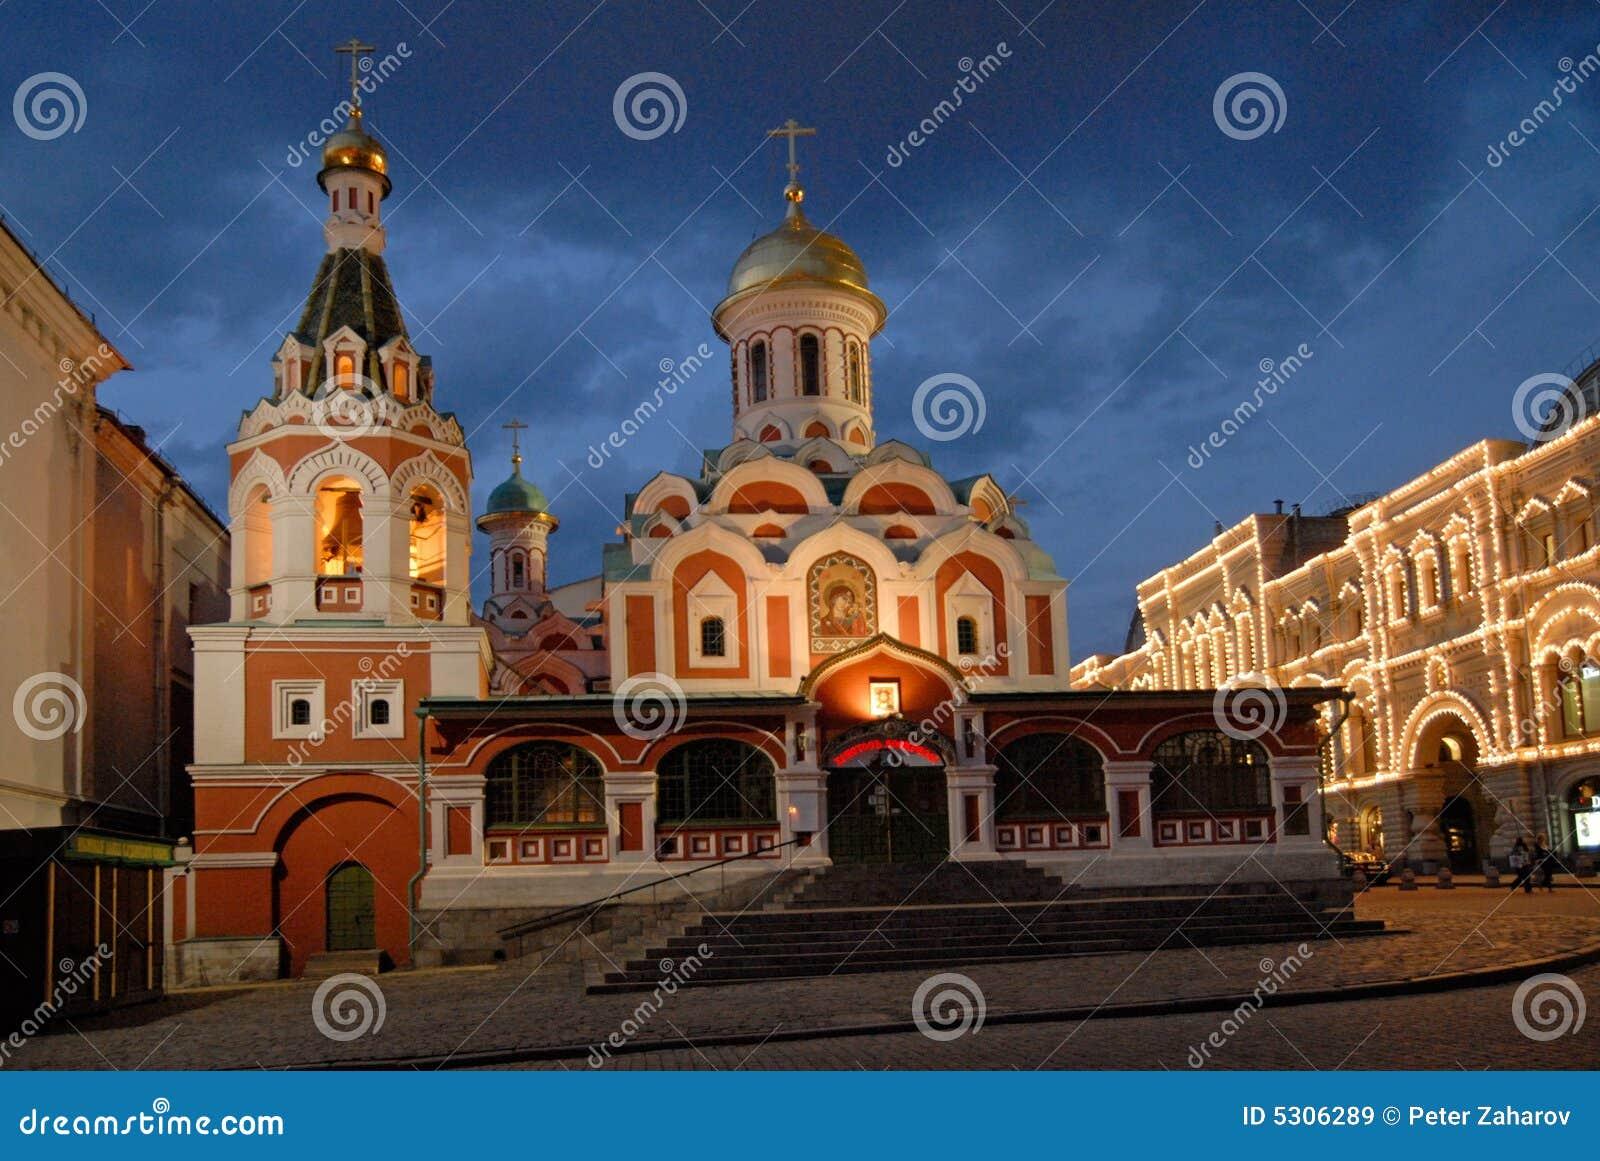 Download Cattedrale Di Kazan. Mosca, Russia. Immagine Stock - Immagine di museo, chiesa: 5306289